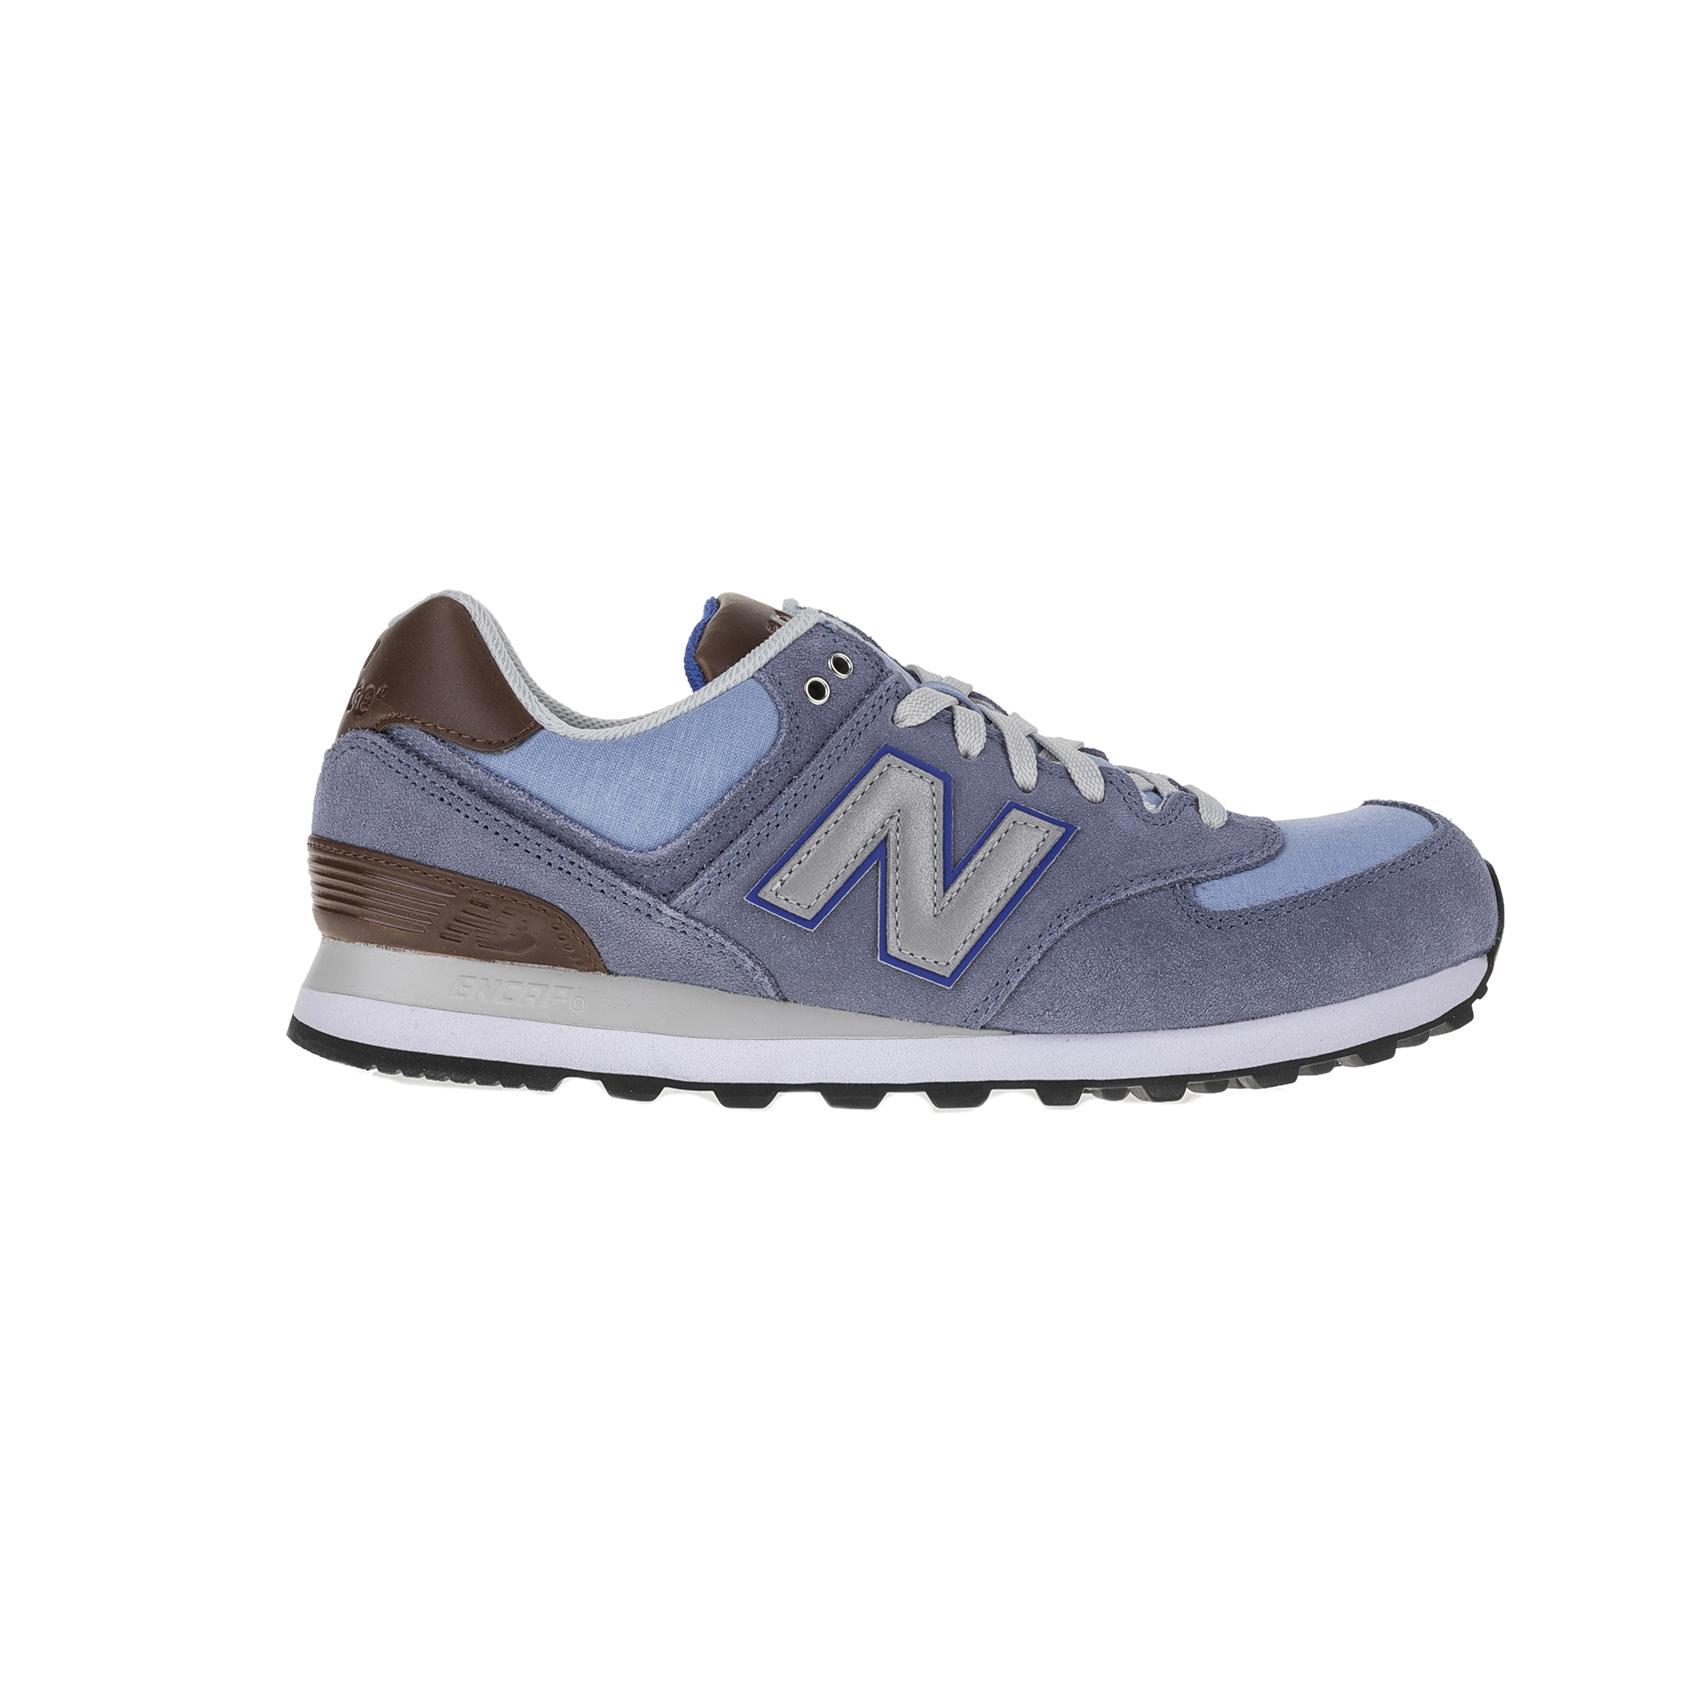 NEW BALANCE – Ανδρικά παπούτσια NEW BALANCE ML574BCD μοβ